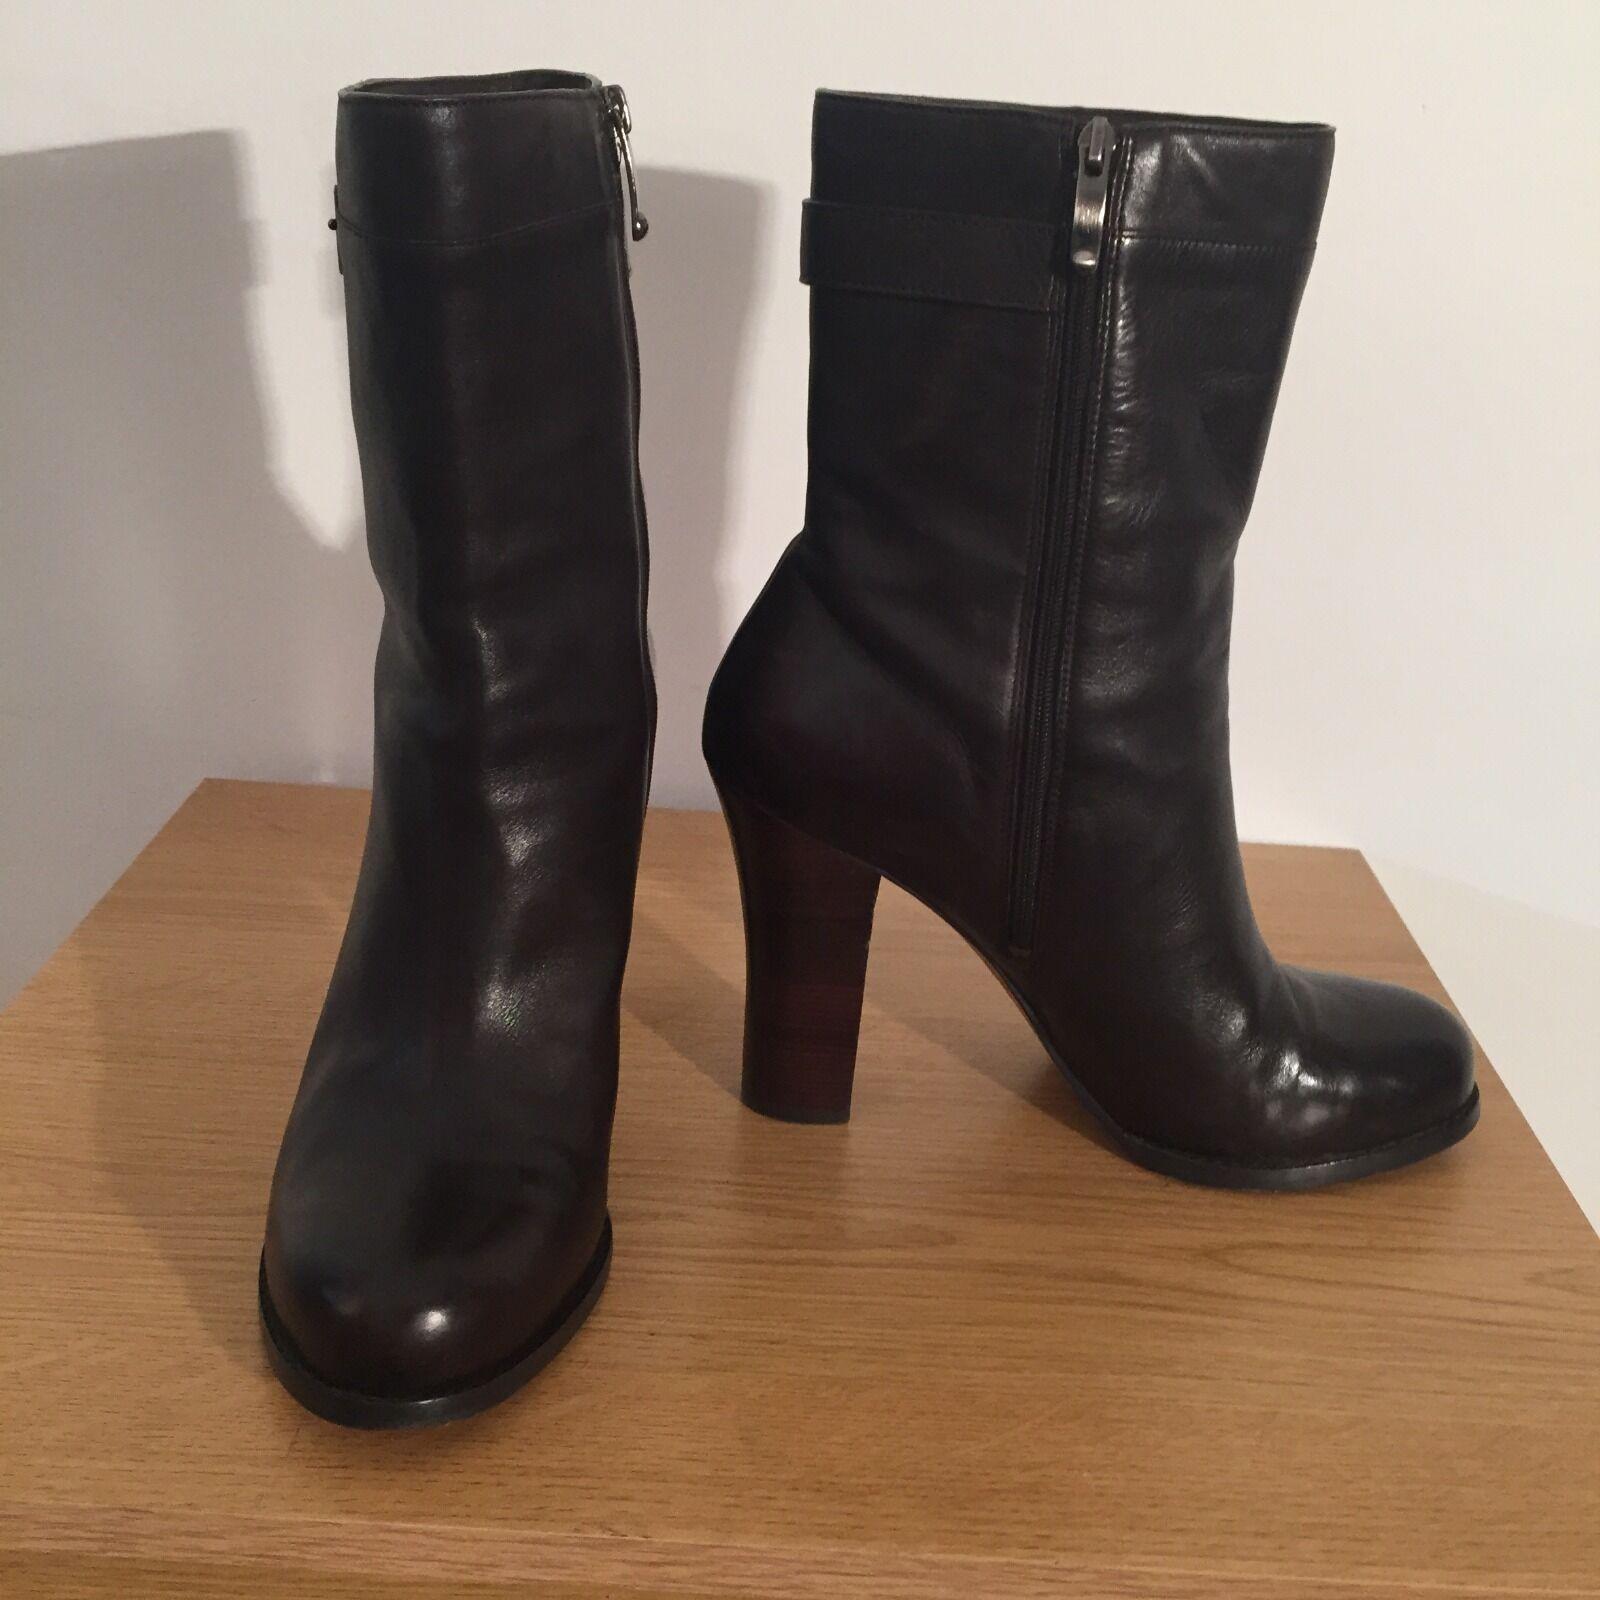 VIA SPIGA dark Braun Leder high heel ankle boots w zip UK 7 / Eur 40 VGC